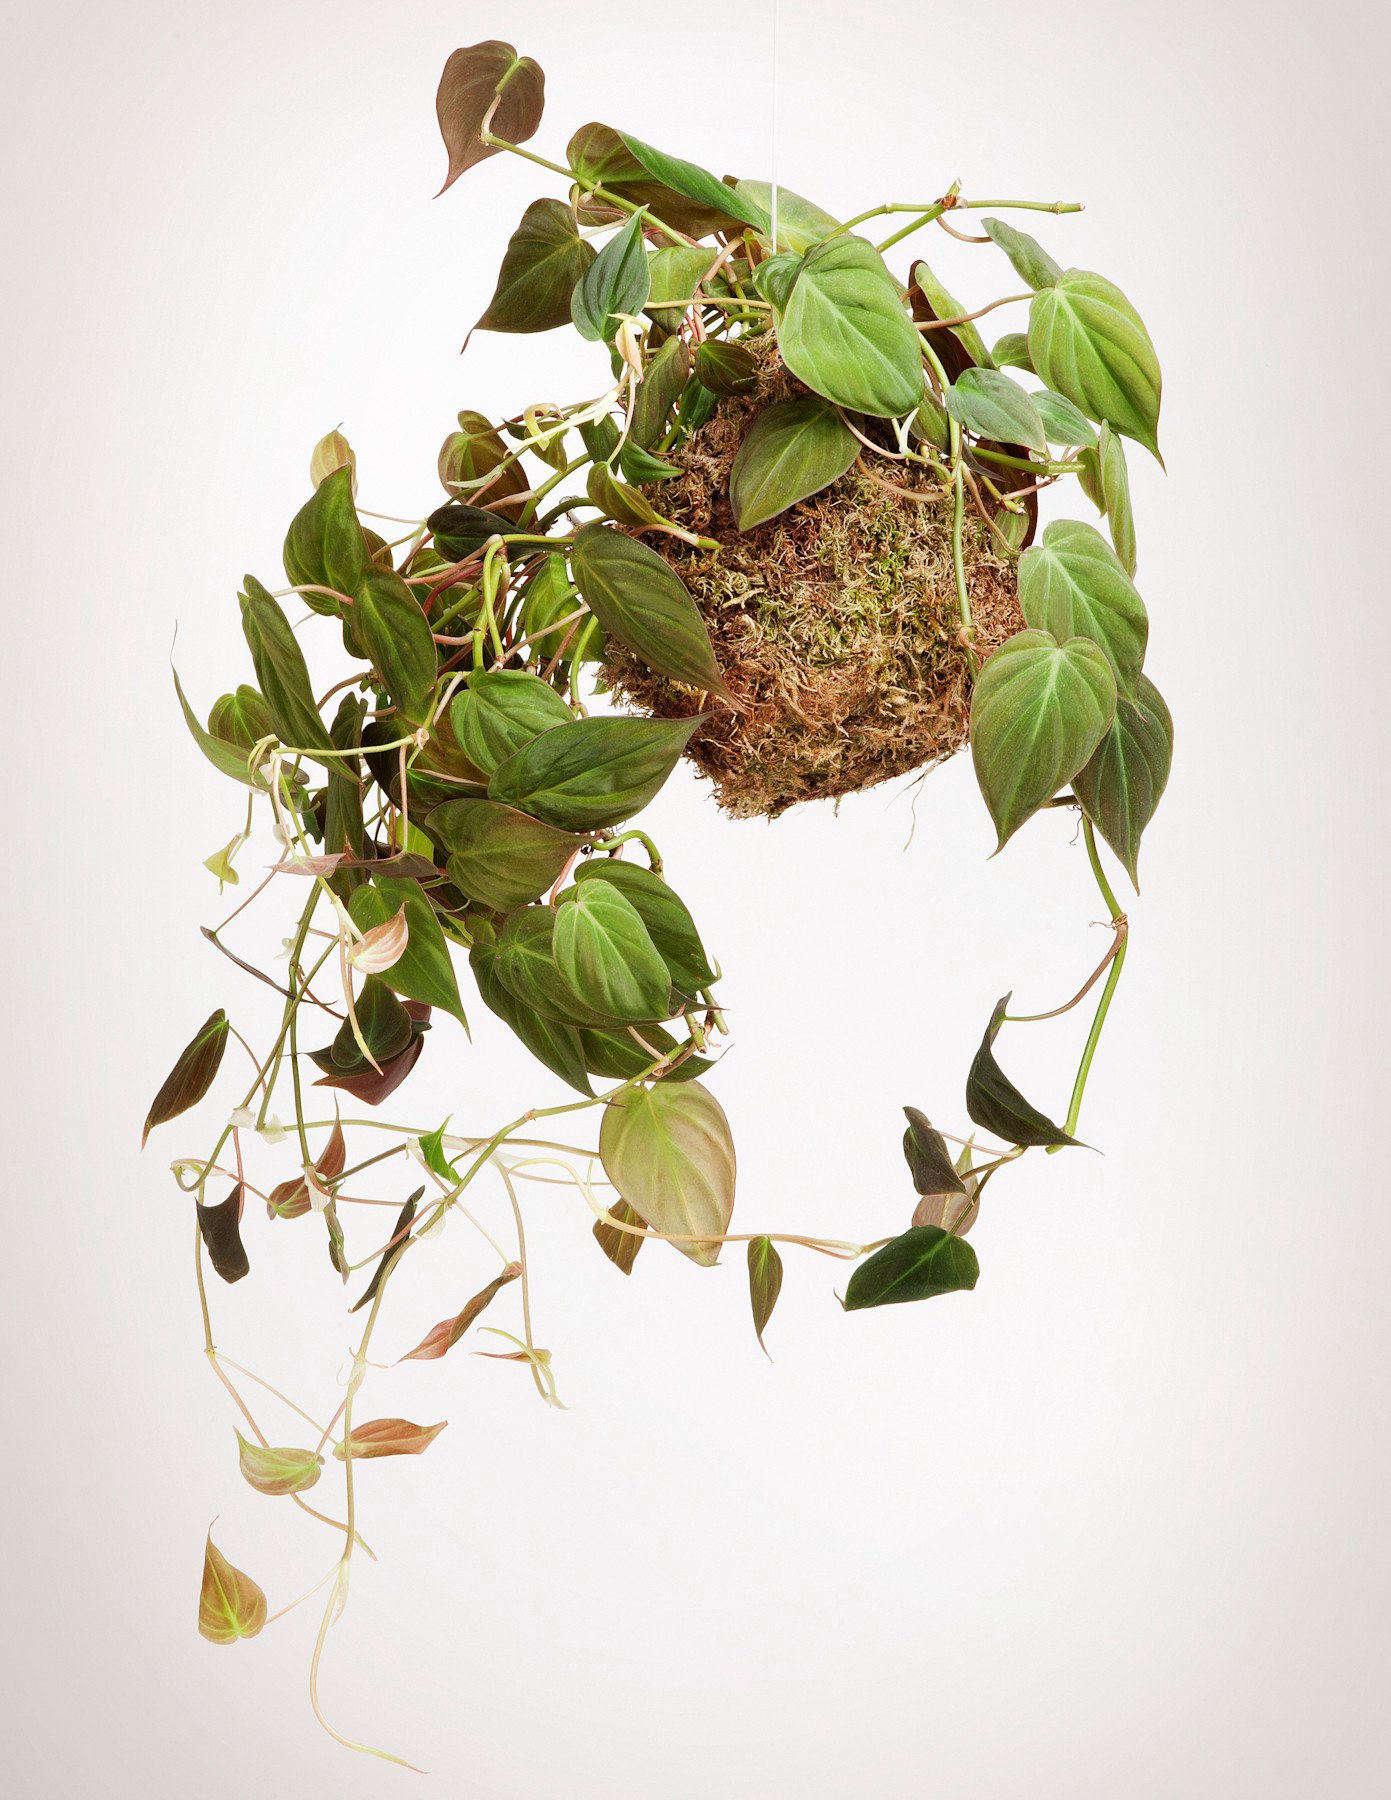 Pistils Nursery makes these Philodendron Kokedamas (aka &#8